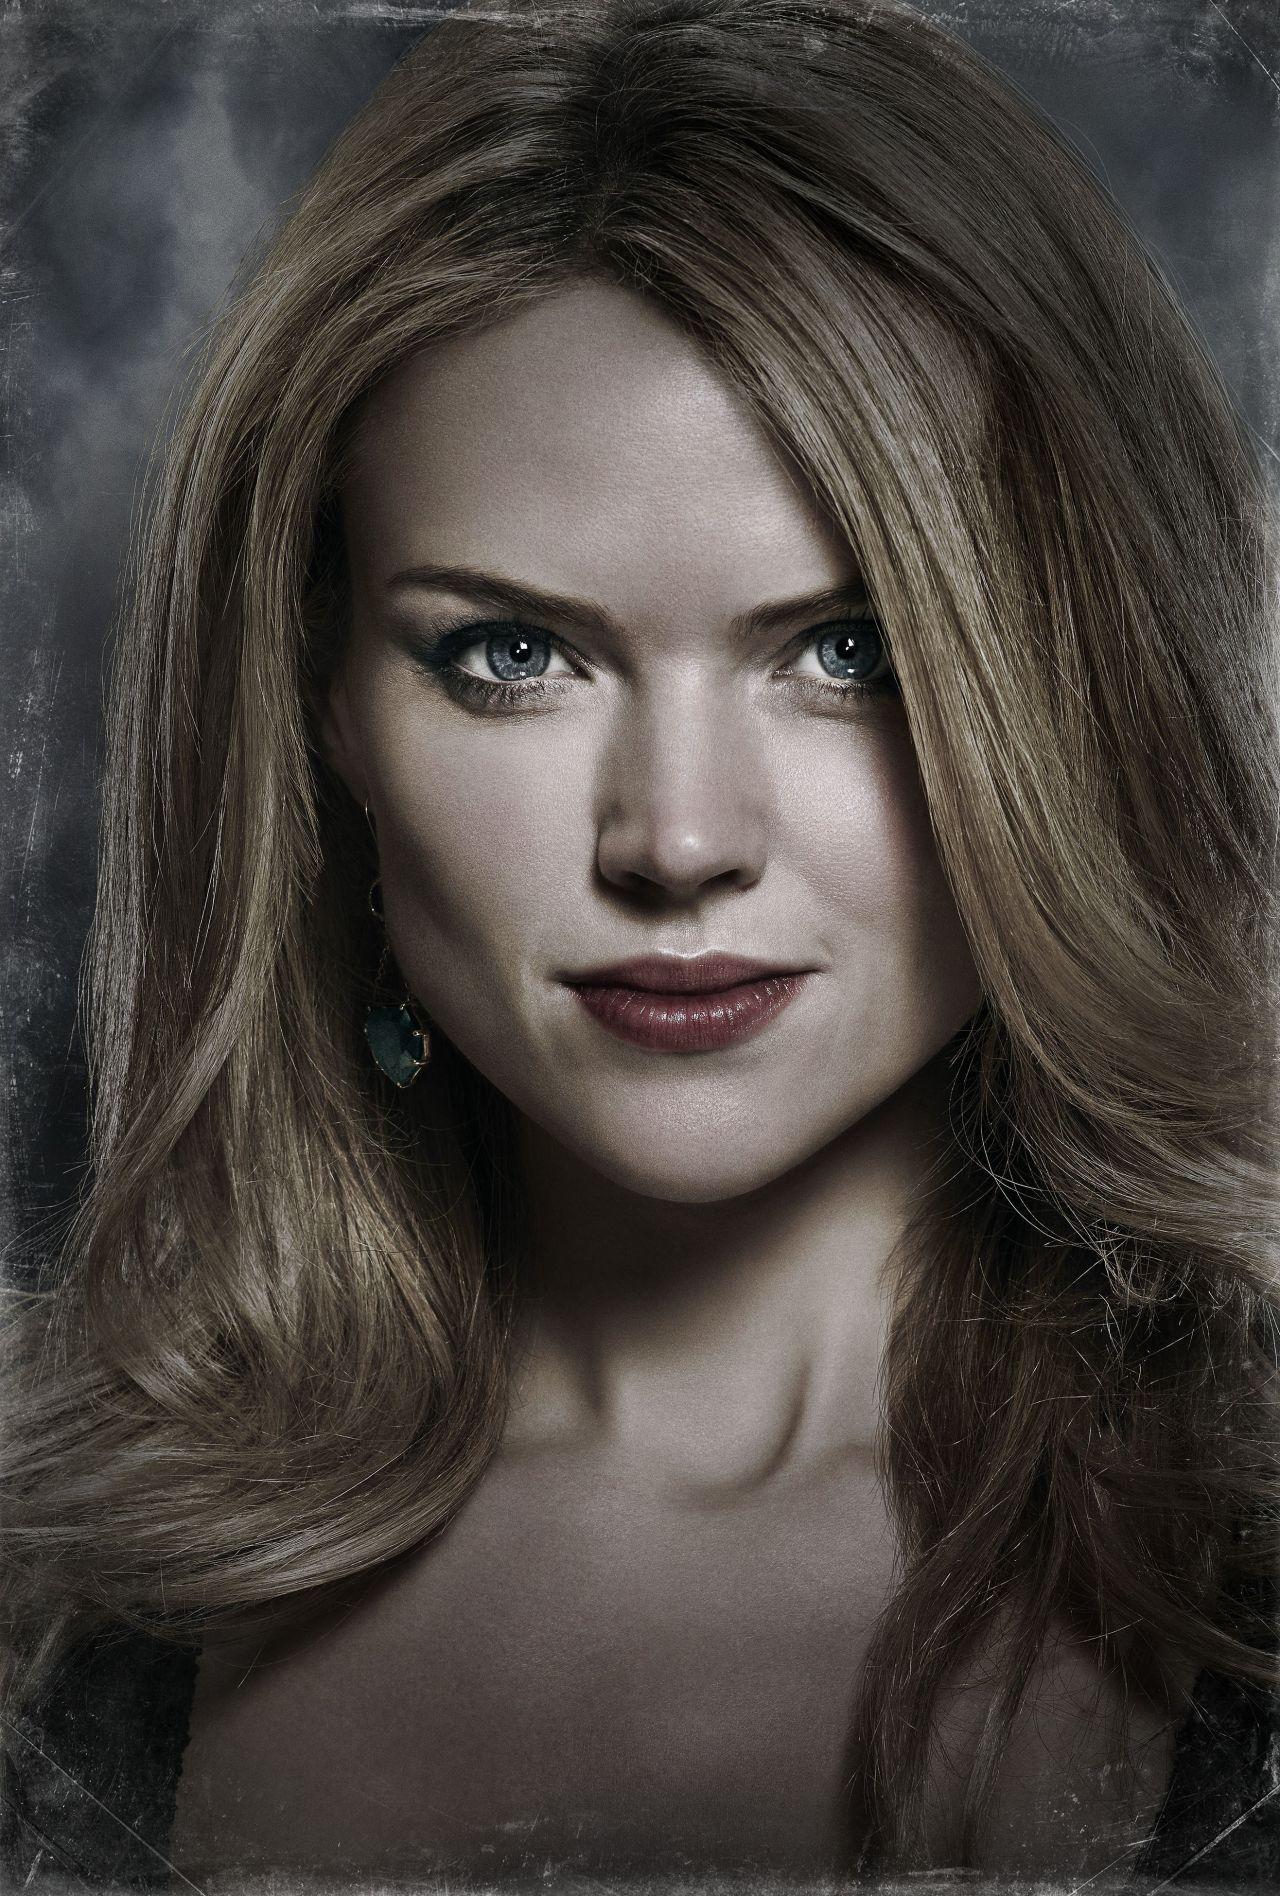 Erin Richards - 'Gotham' TV Series Season 1 Promoshoot